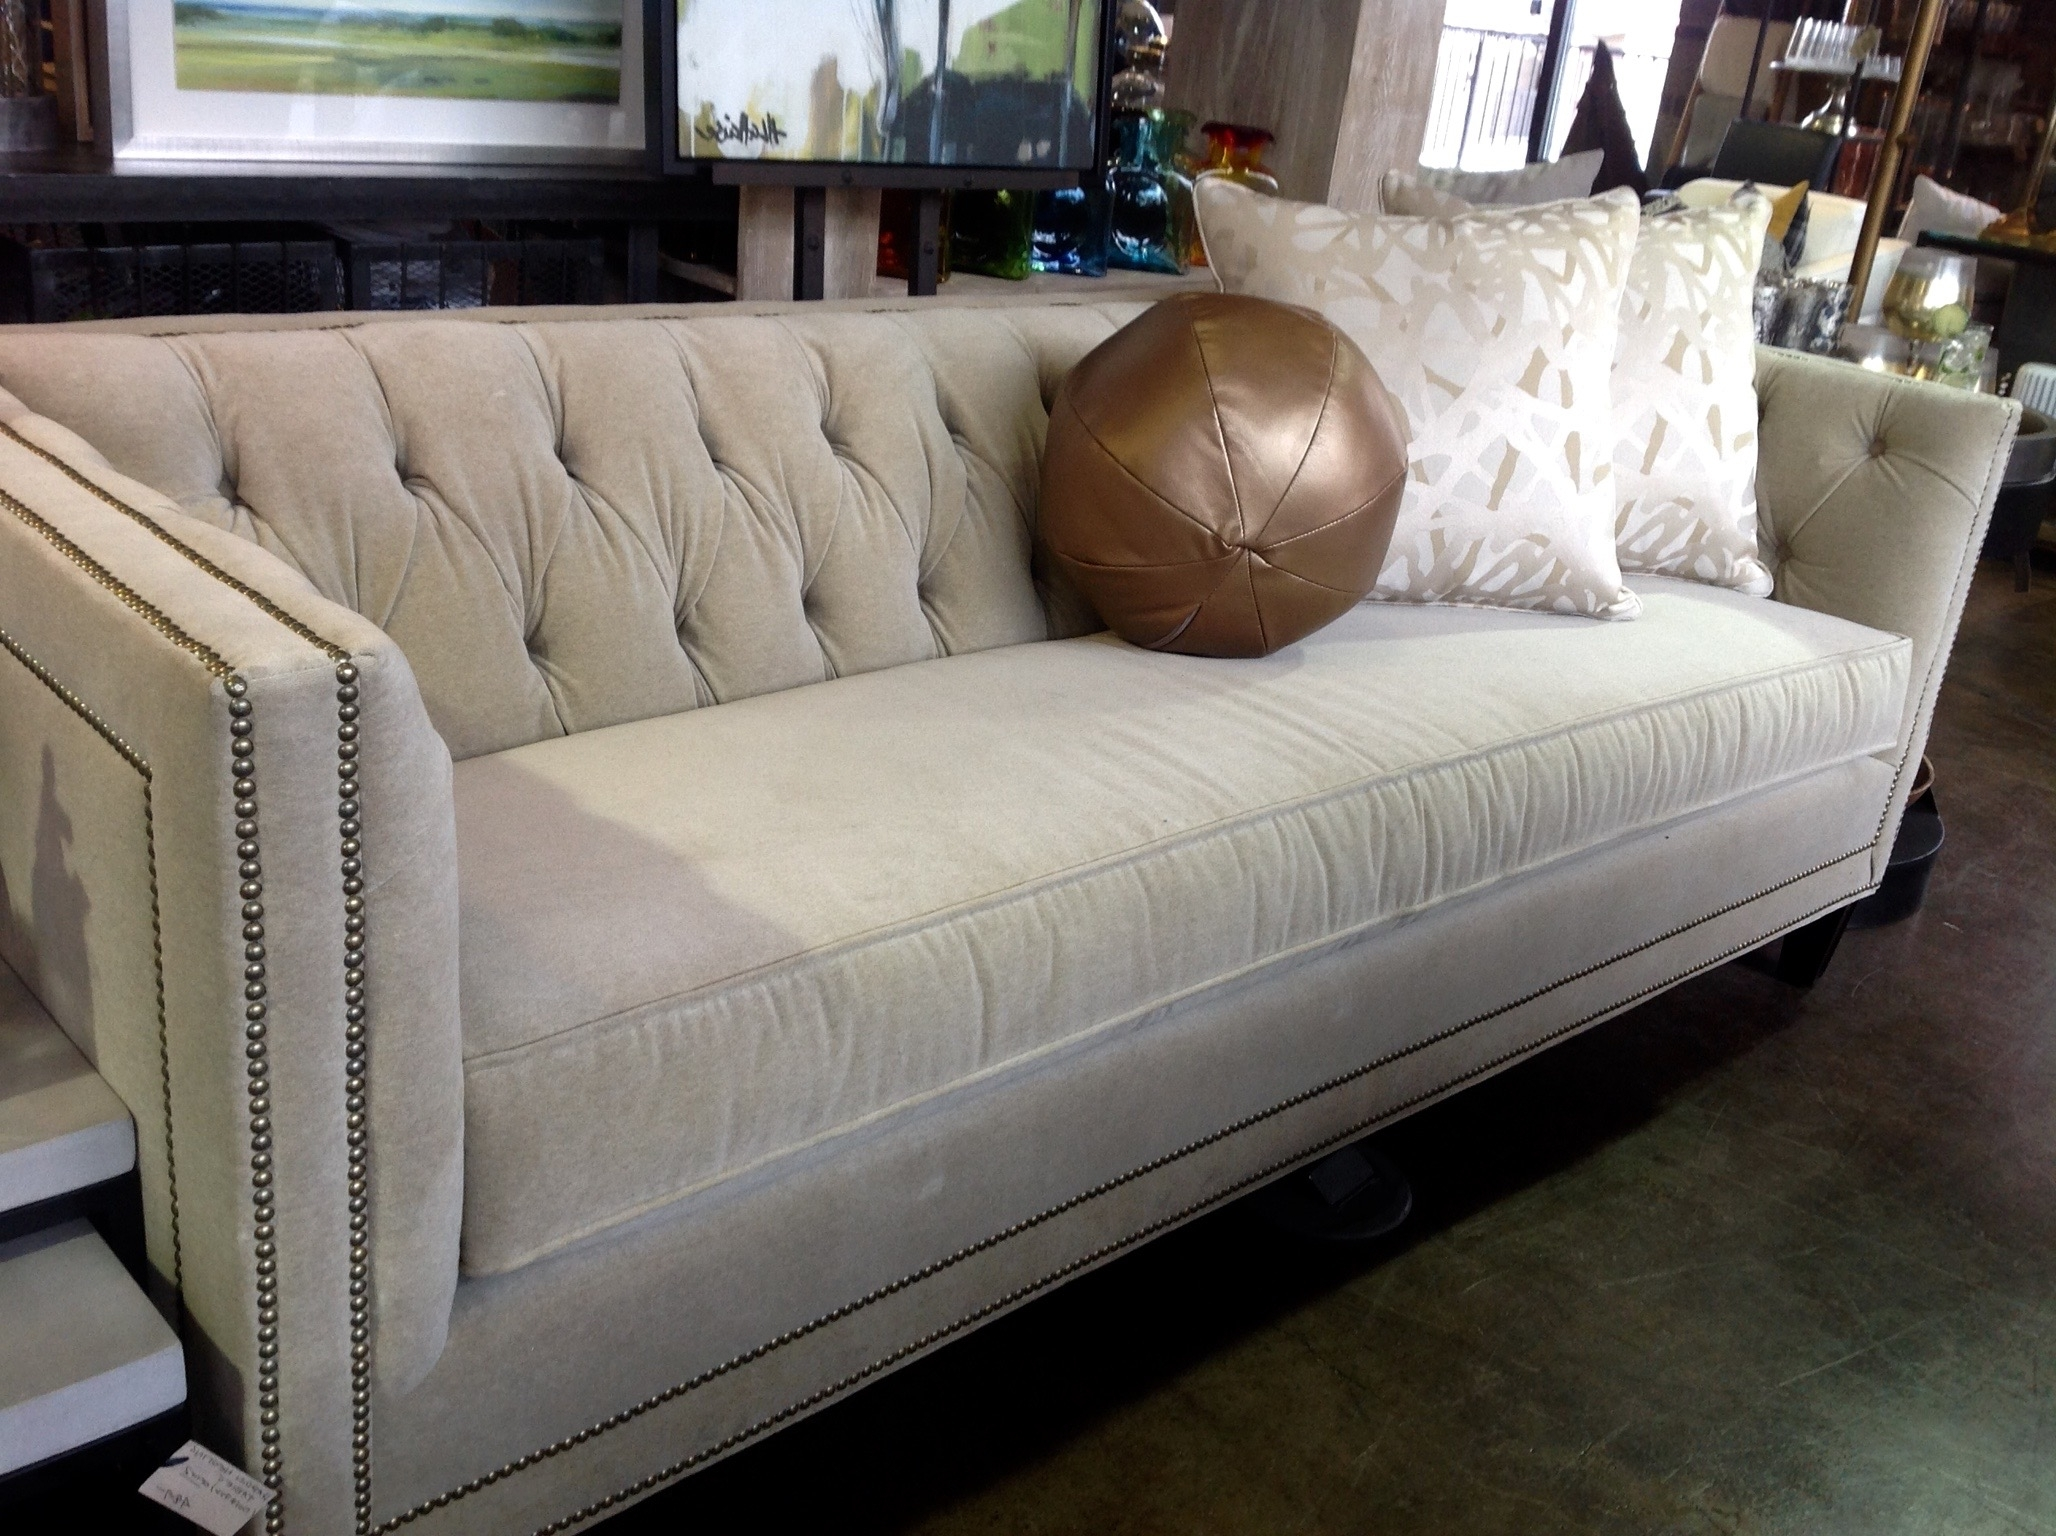 Kaden Sofa – Lulu's Furniture & Decor With Regard To Current Norwalk Sofas (View 8 of 20)